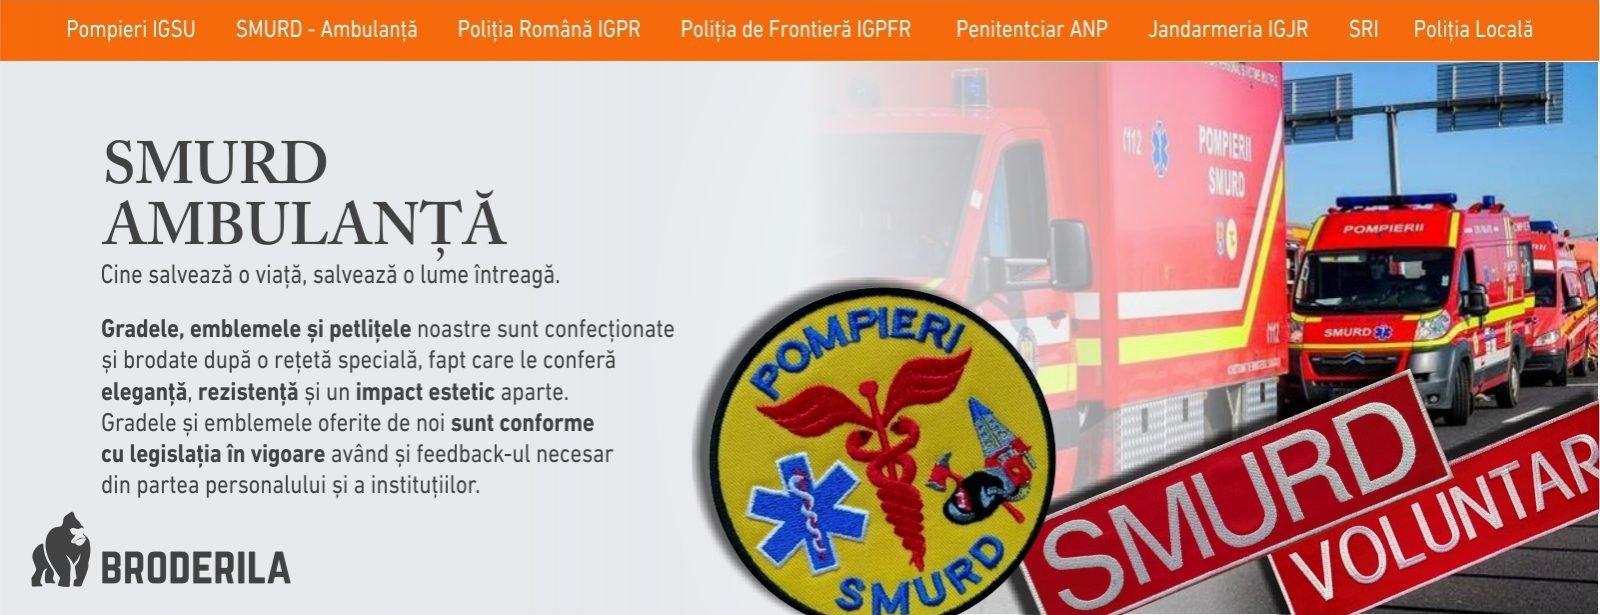 emblema smurd brodata grade medici paramedici grade militare ambulanta broderila.ro grade militare brodate